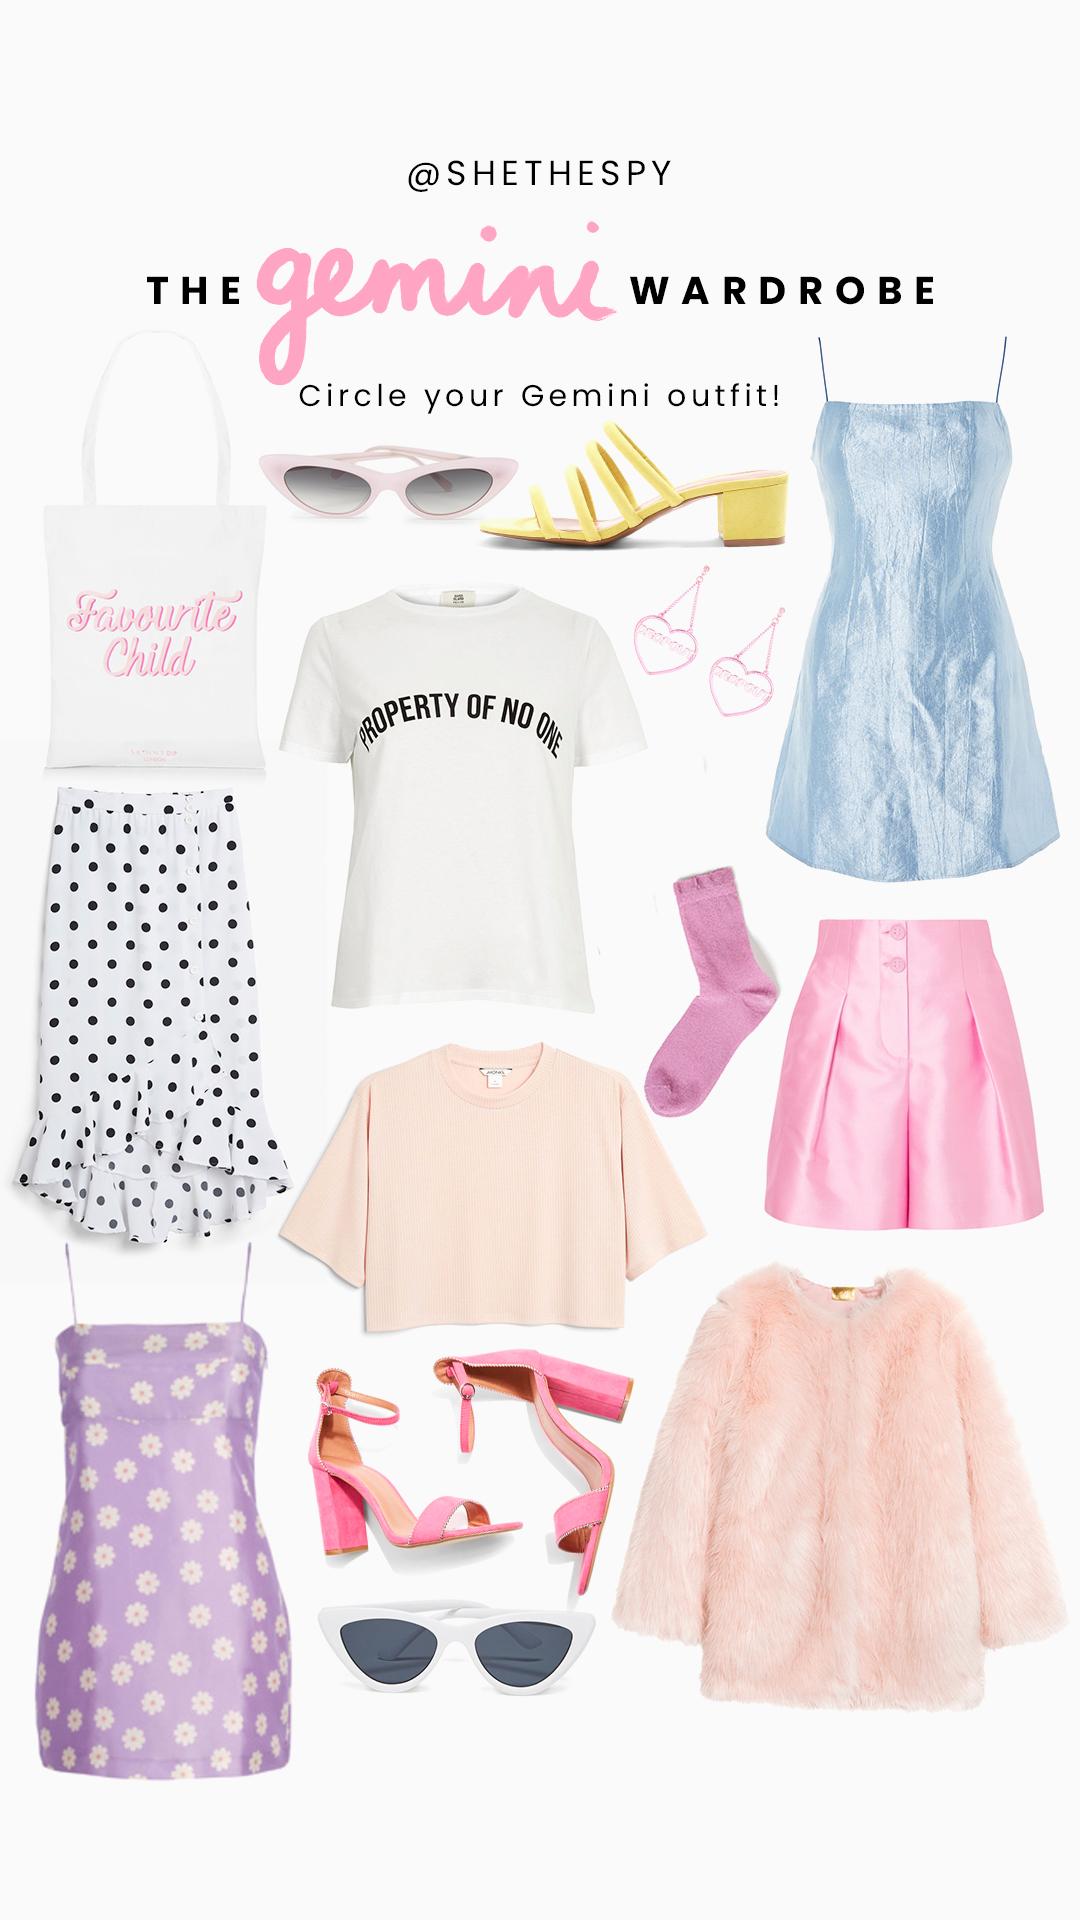 Shop Gemini - Bag: Skinny DipPink sunglasses: BandoYellow shoes: TopshopEarrings: Skinny DipBlue Dress: TopshopPolka dot skirt: MonkiPink shorts: Giorgio ArmaniSocks: MonkiWhite tee: River IslandPeach tee: MonkiFaux fur jacket: H&MPurple dress: Realisation ParPink shoes: TopshopWhite sunglasses: Bando